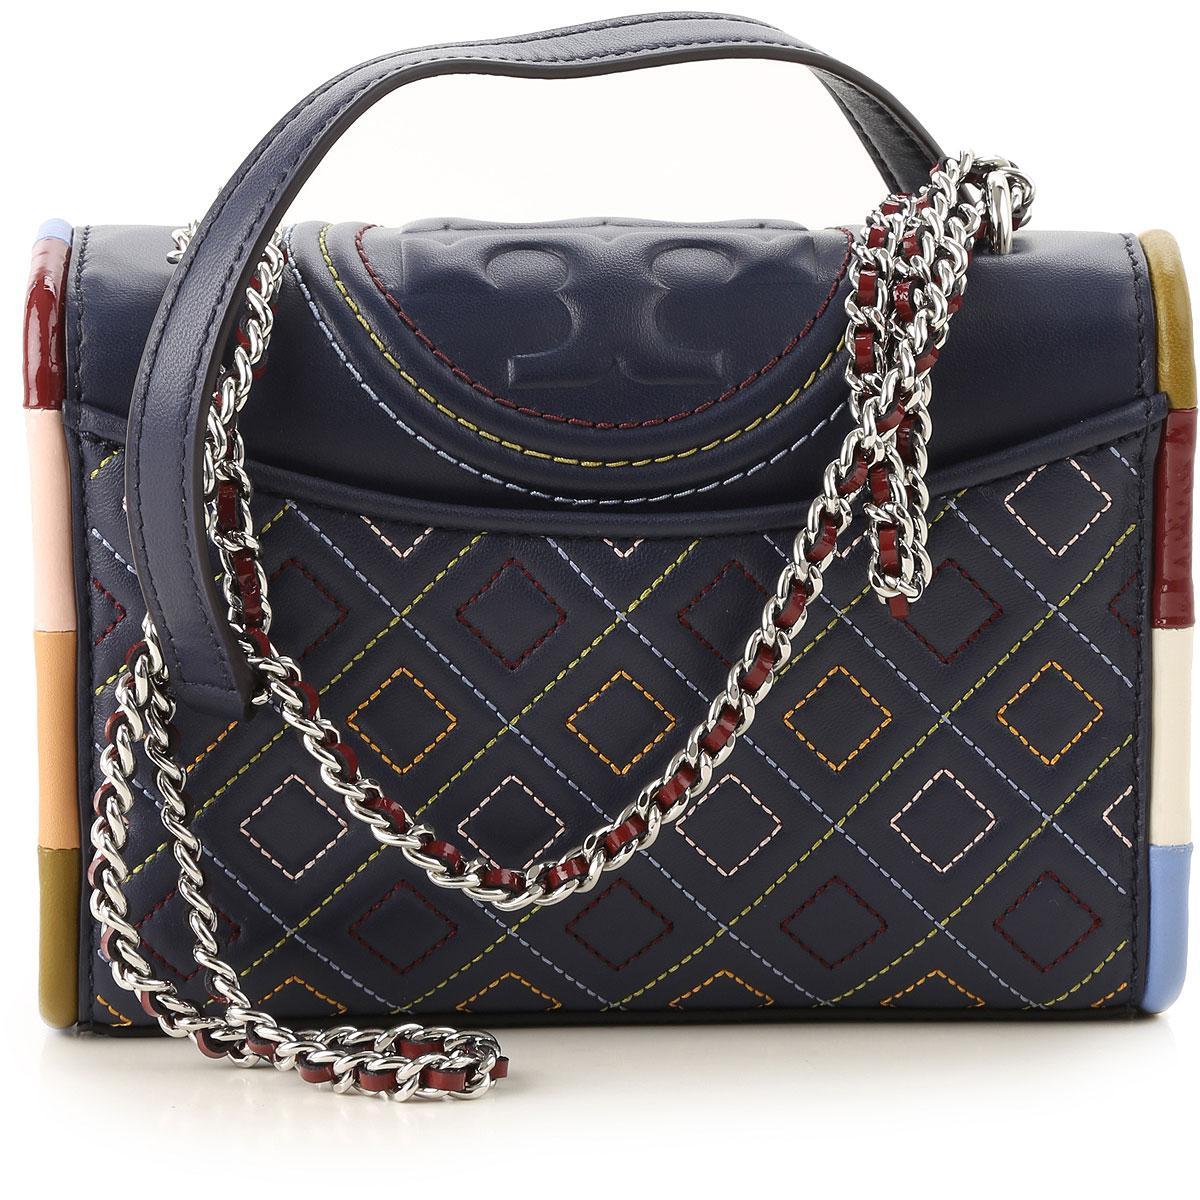 fcea0c7a679 Tory Burch - Blue Shoulder Bag For Women On Sale - Lyst. View fullscreen